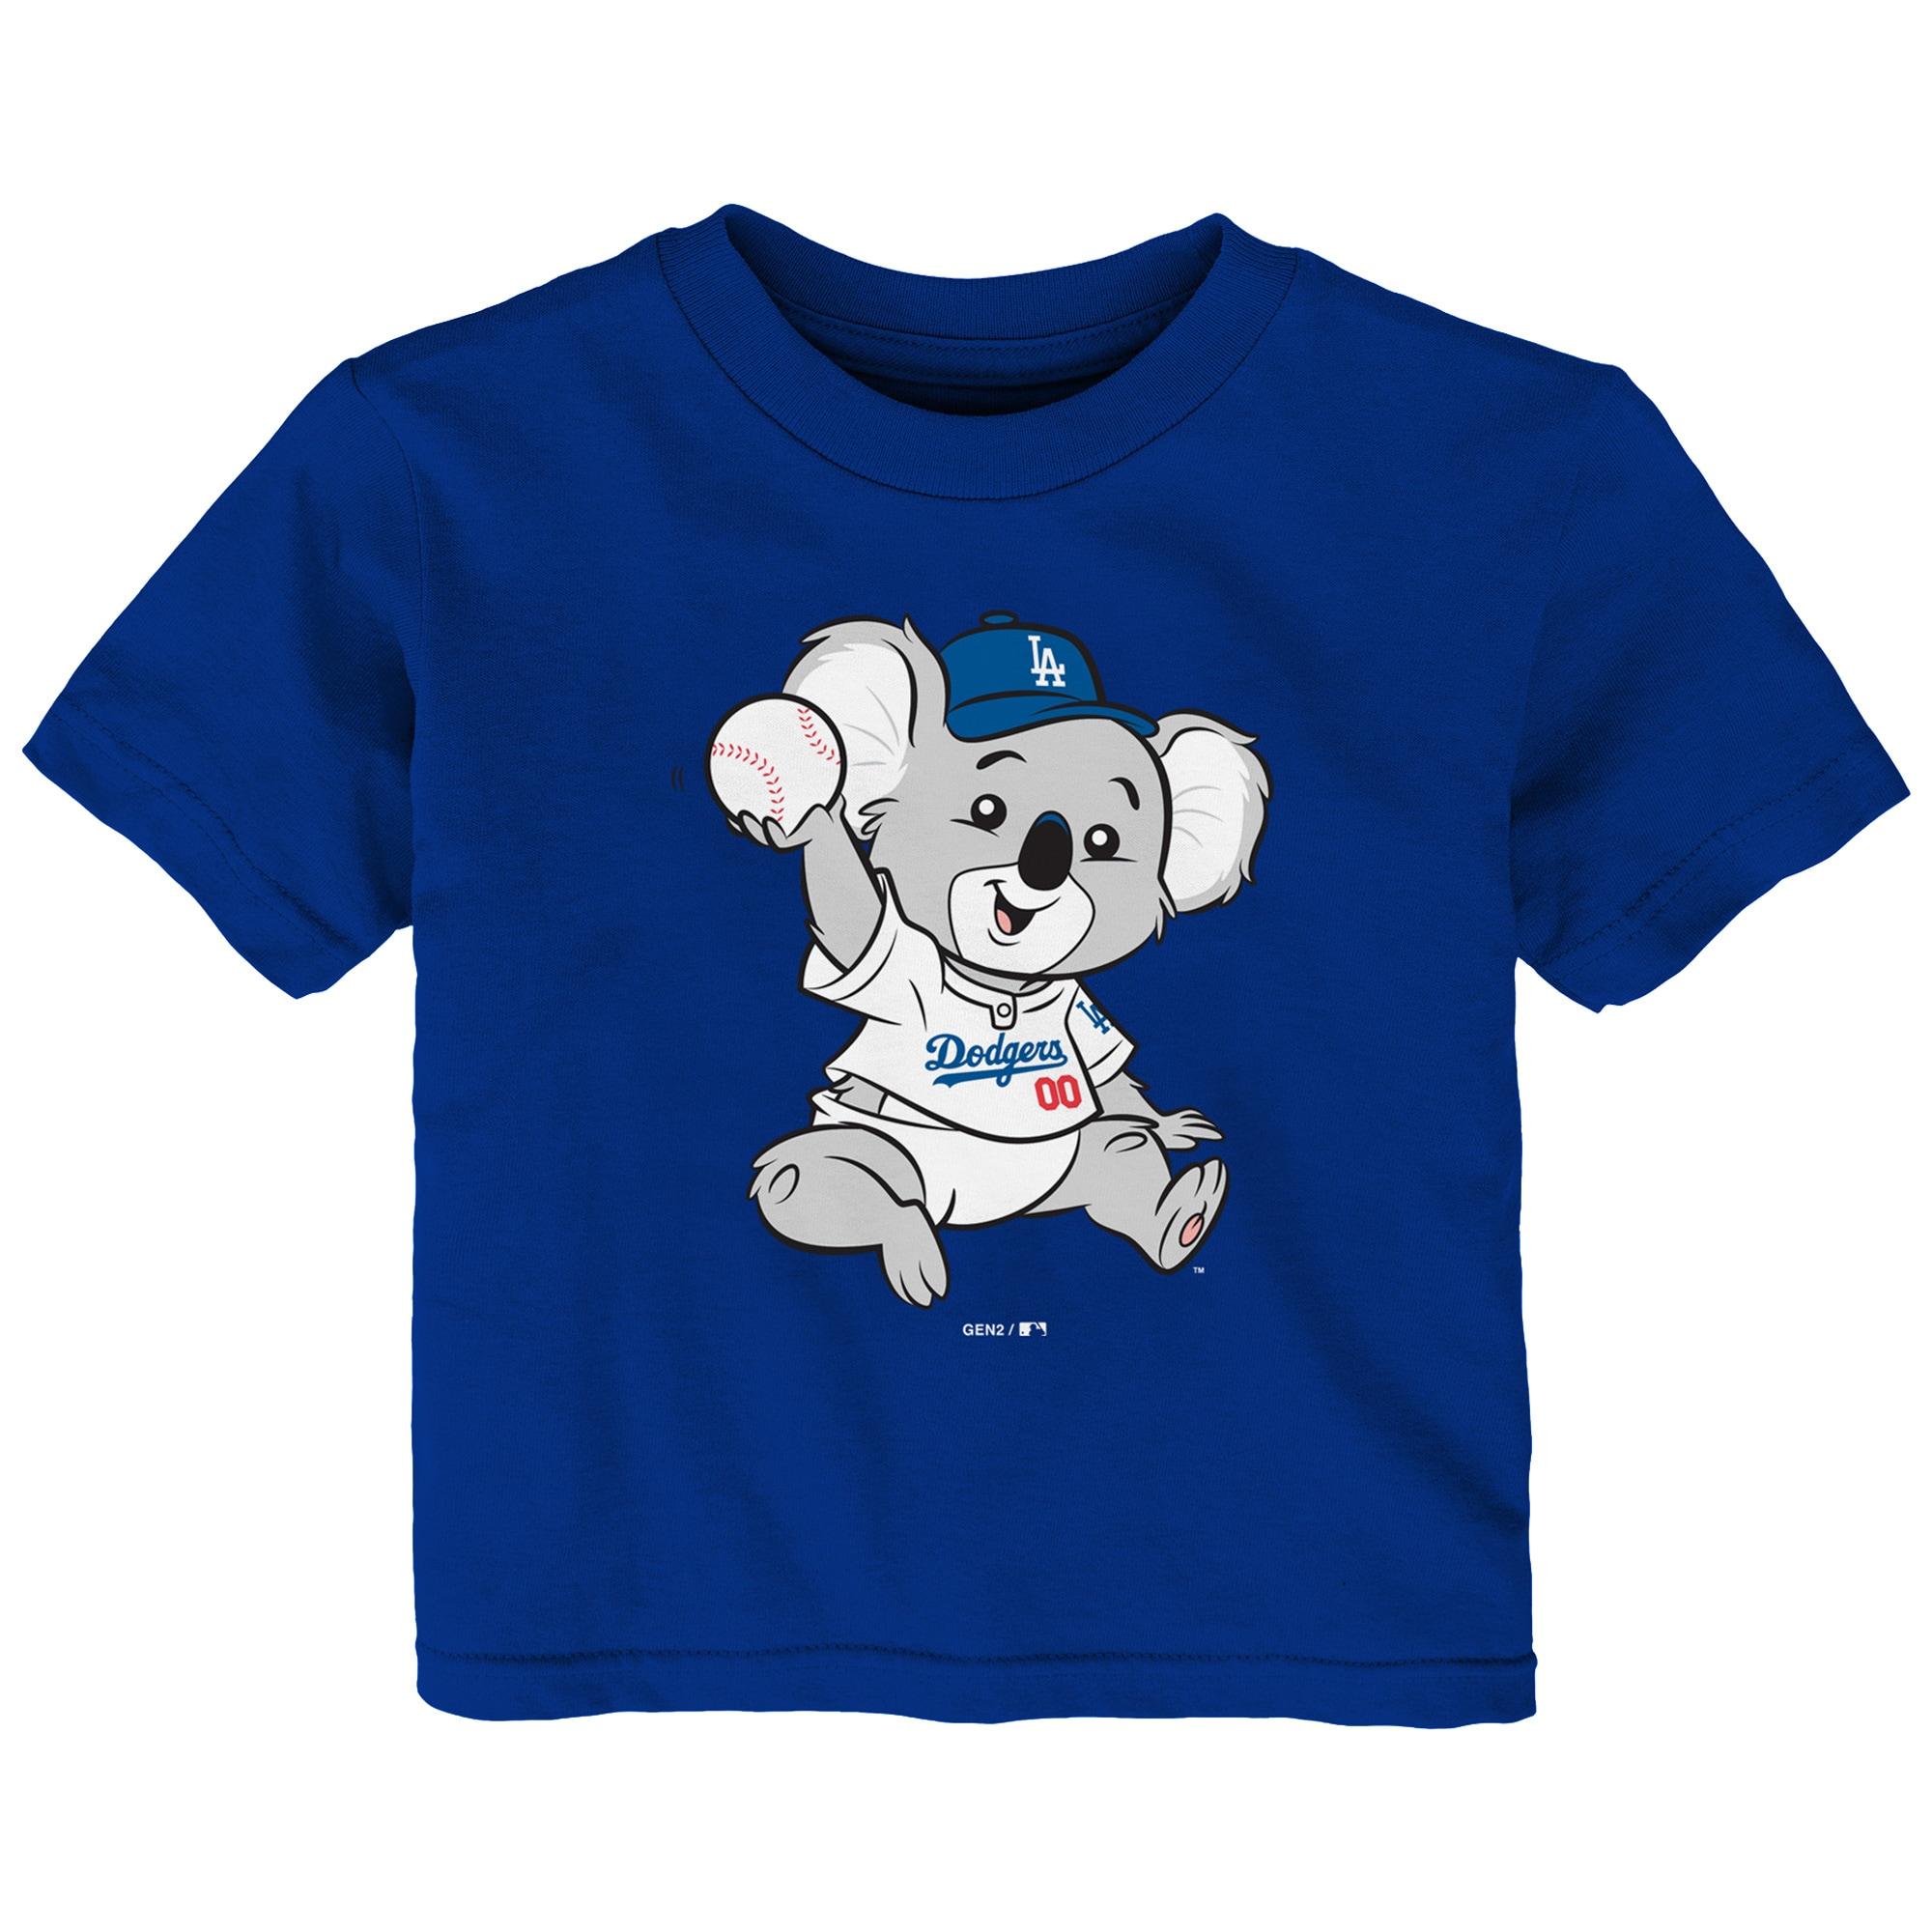 Los Angeles Dodgers Infant Baby Mascot T-Shirt - Royal